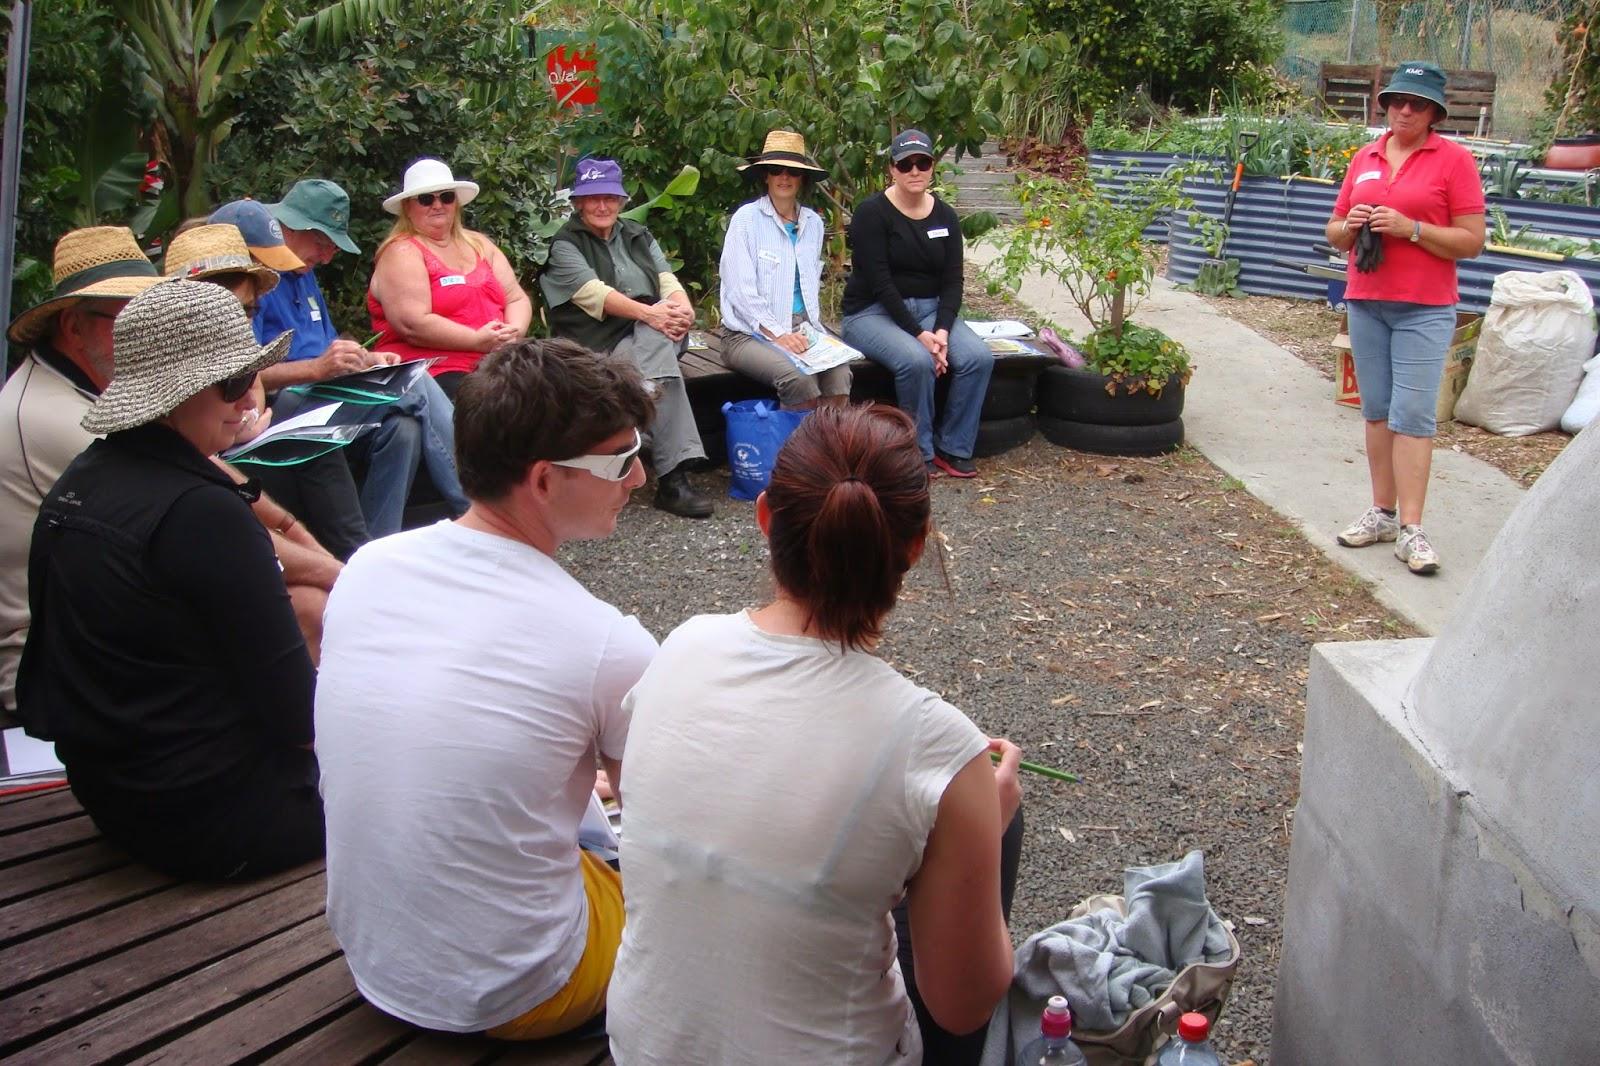 kiama community garden kiamagardens gmail com starting a